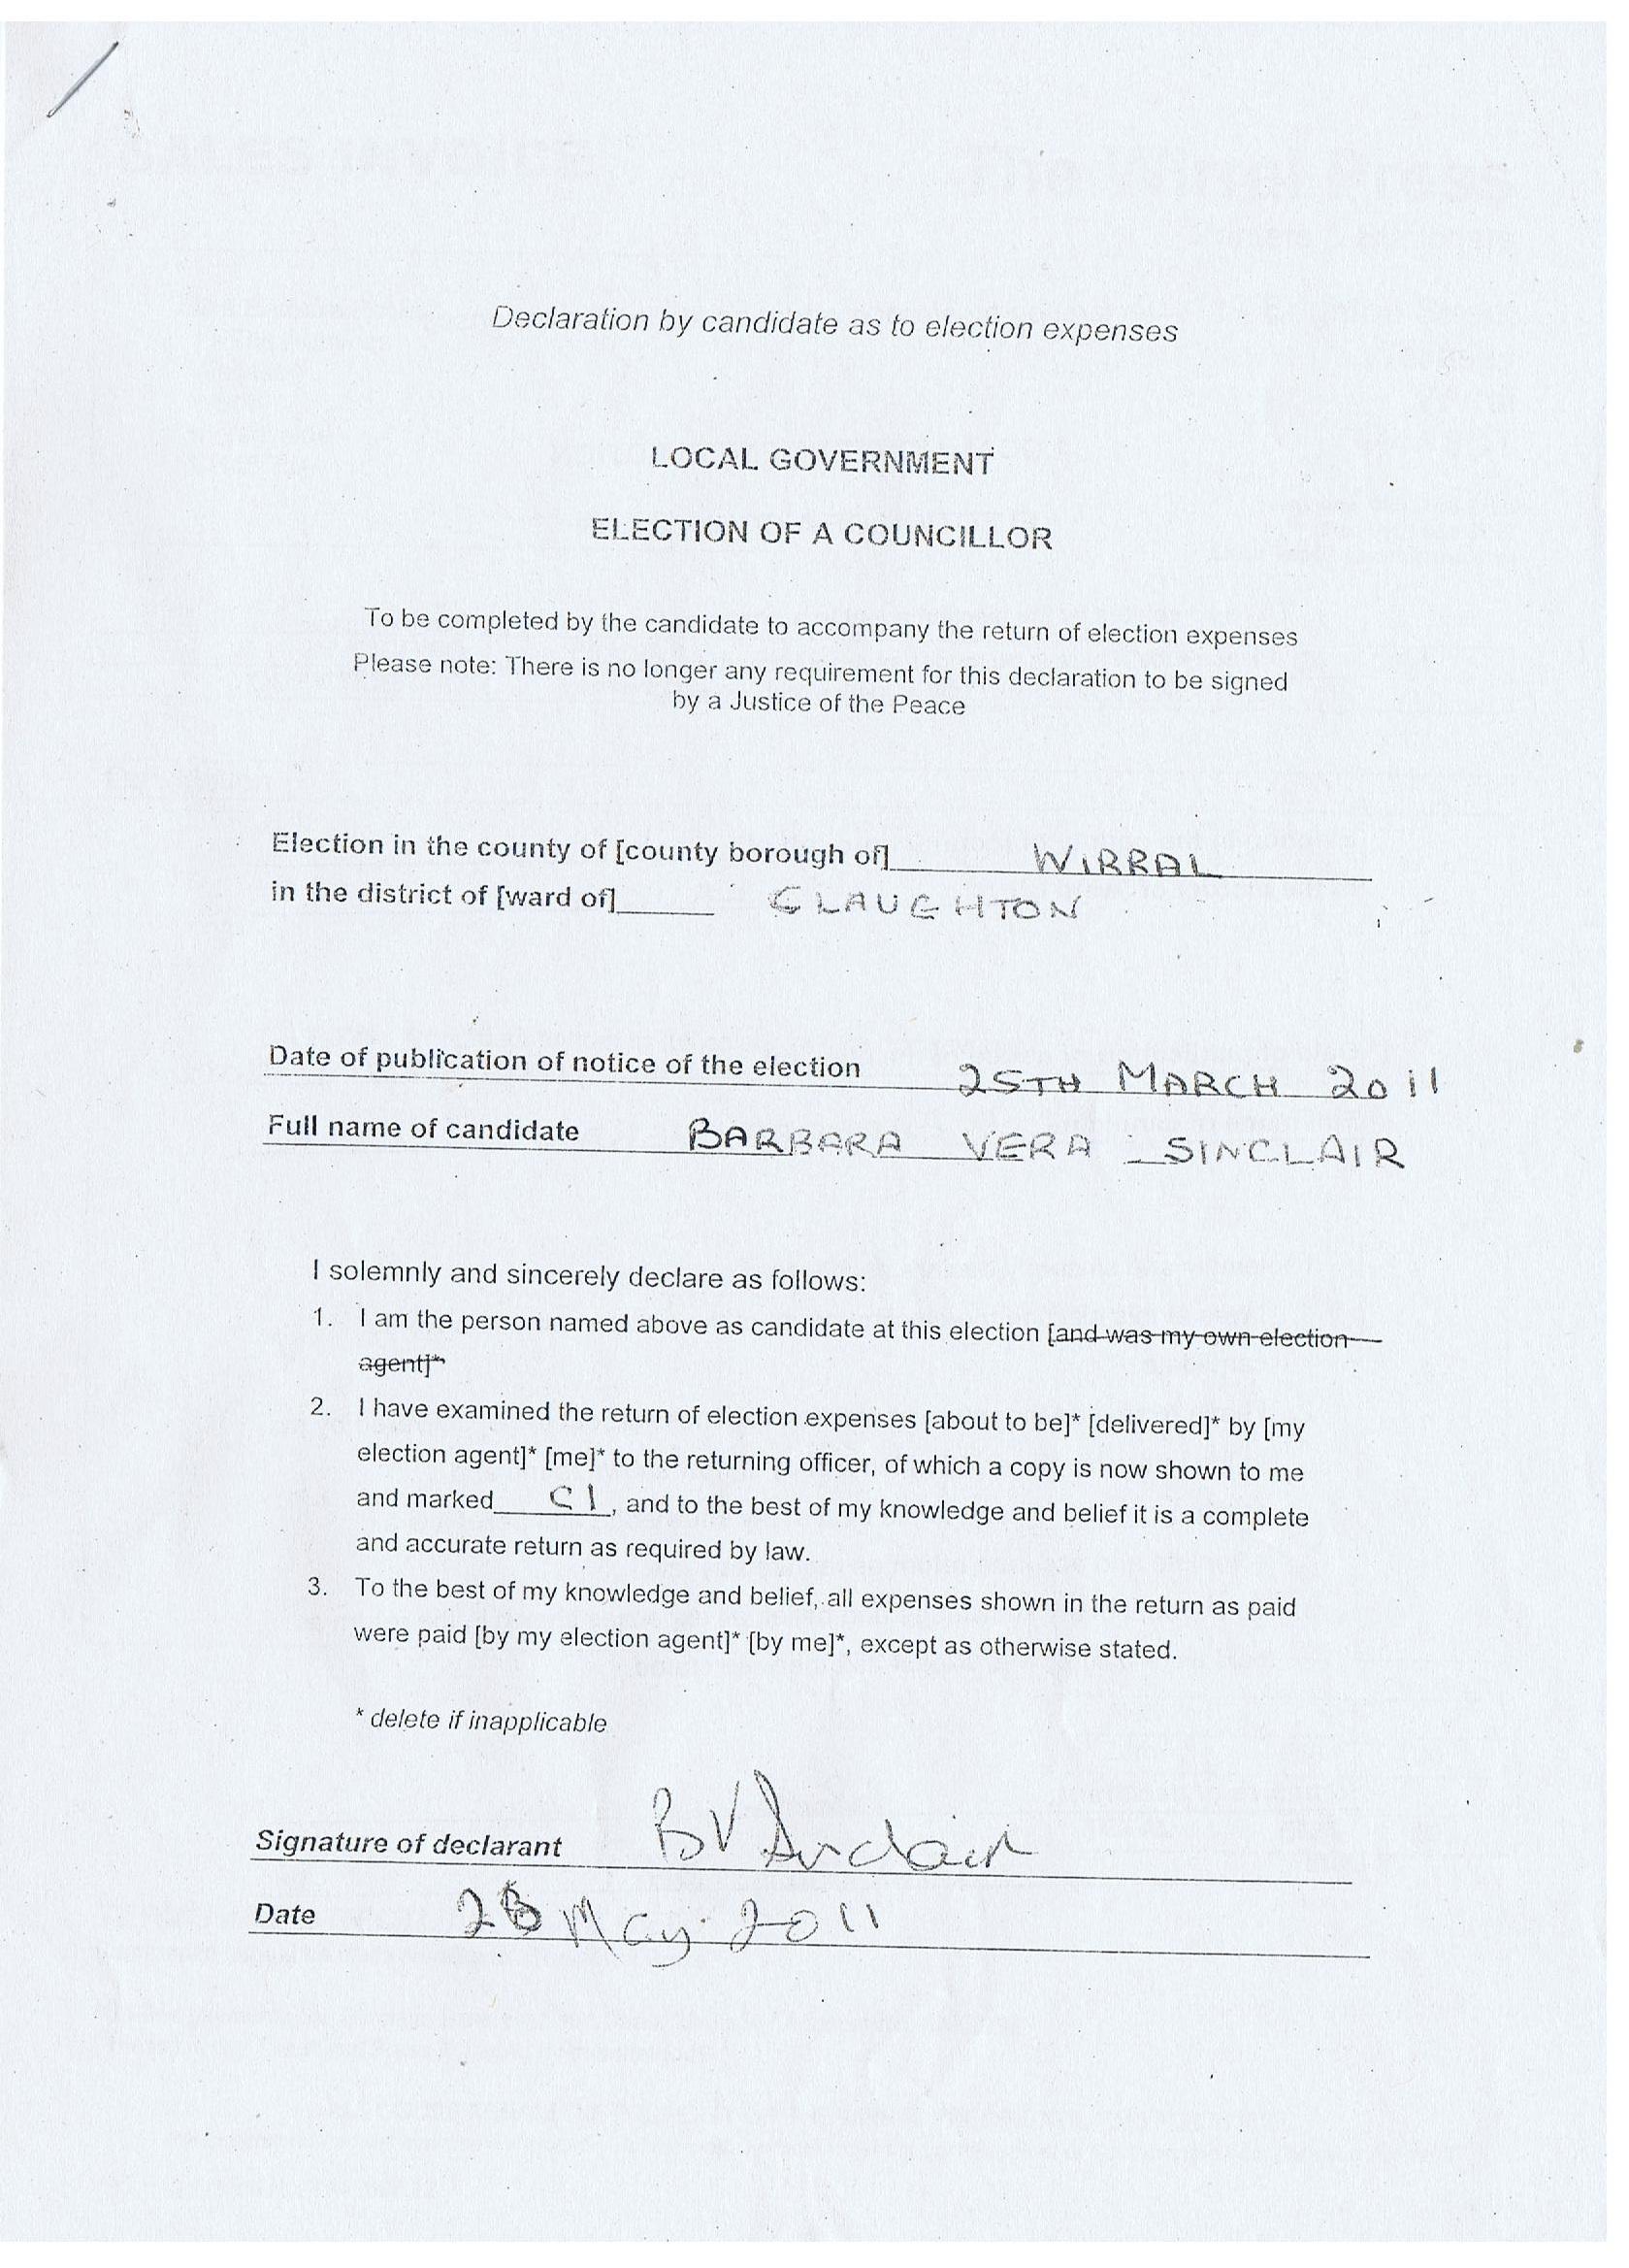 Candidate Declaration (Barbara Sinclair) Claughton ward 2011 Wirral Borough Council agent: Barbara Poole